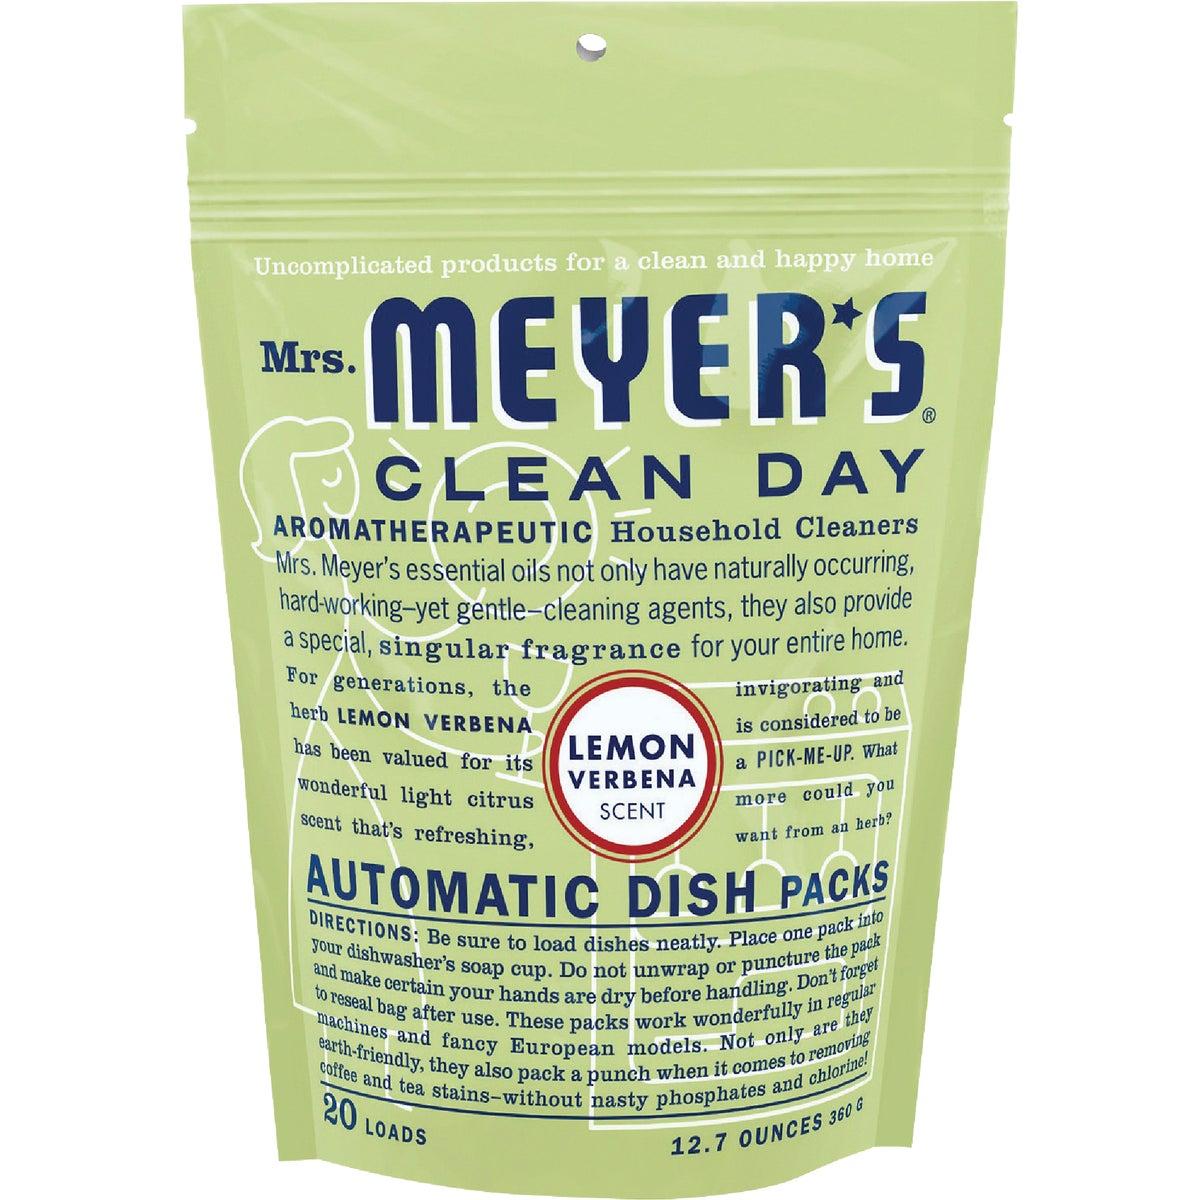 Mrs. Meyer's Clean Day Dishwasher Detergent Soap Packs